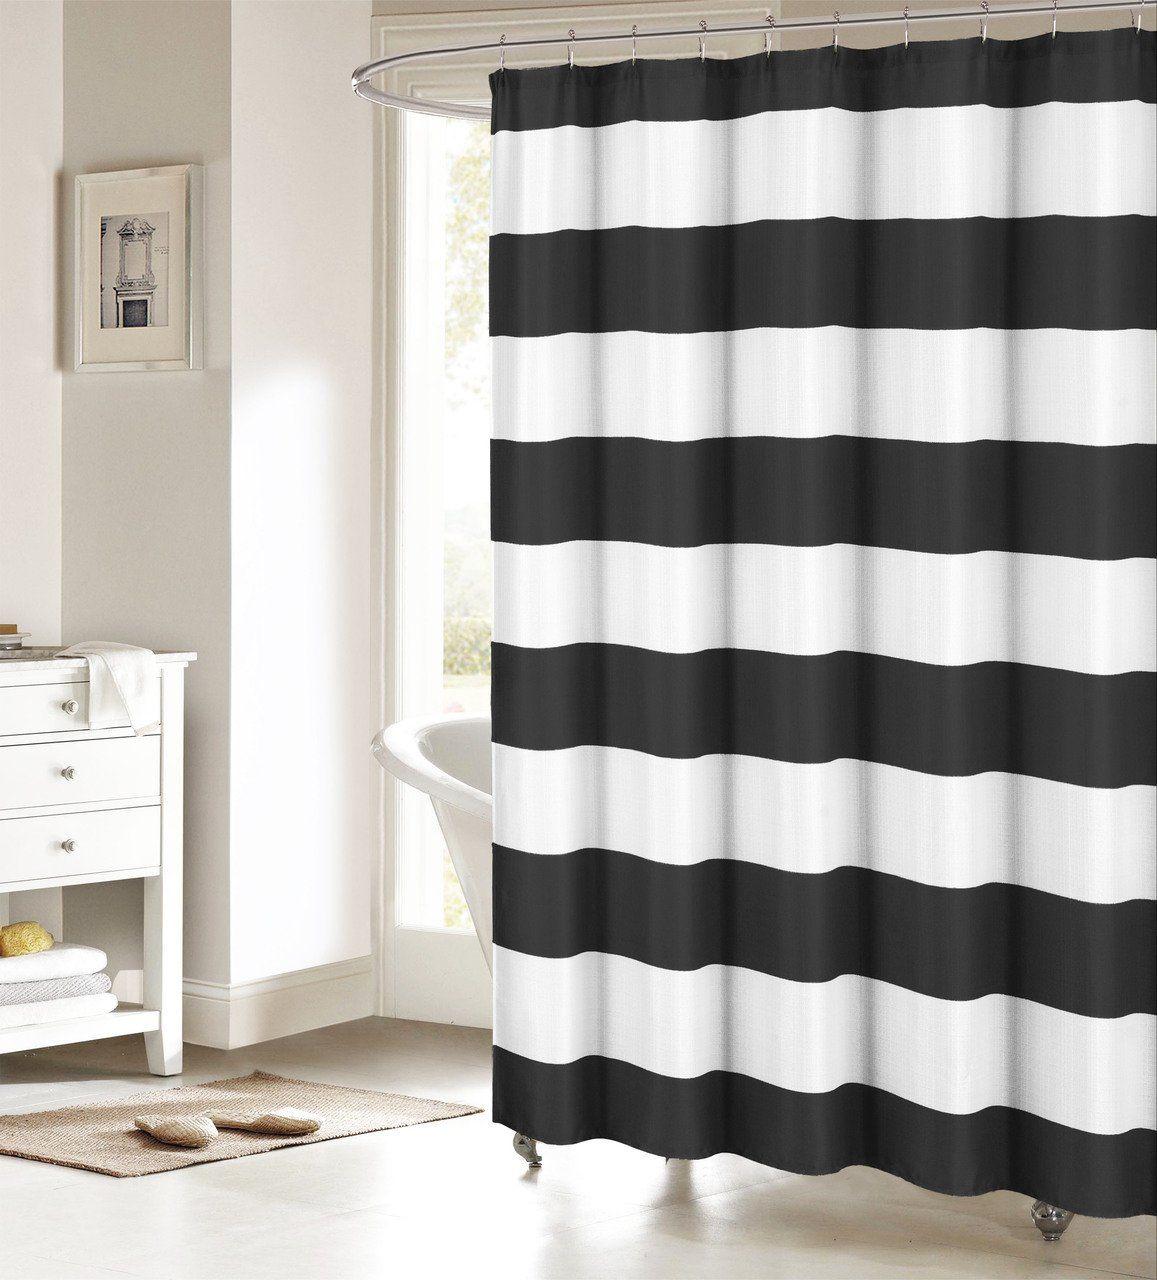 Fabric Shower Curtain: Nautical Stripe Design (Black and White ...